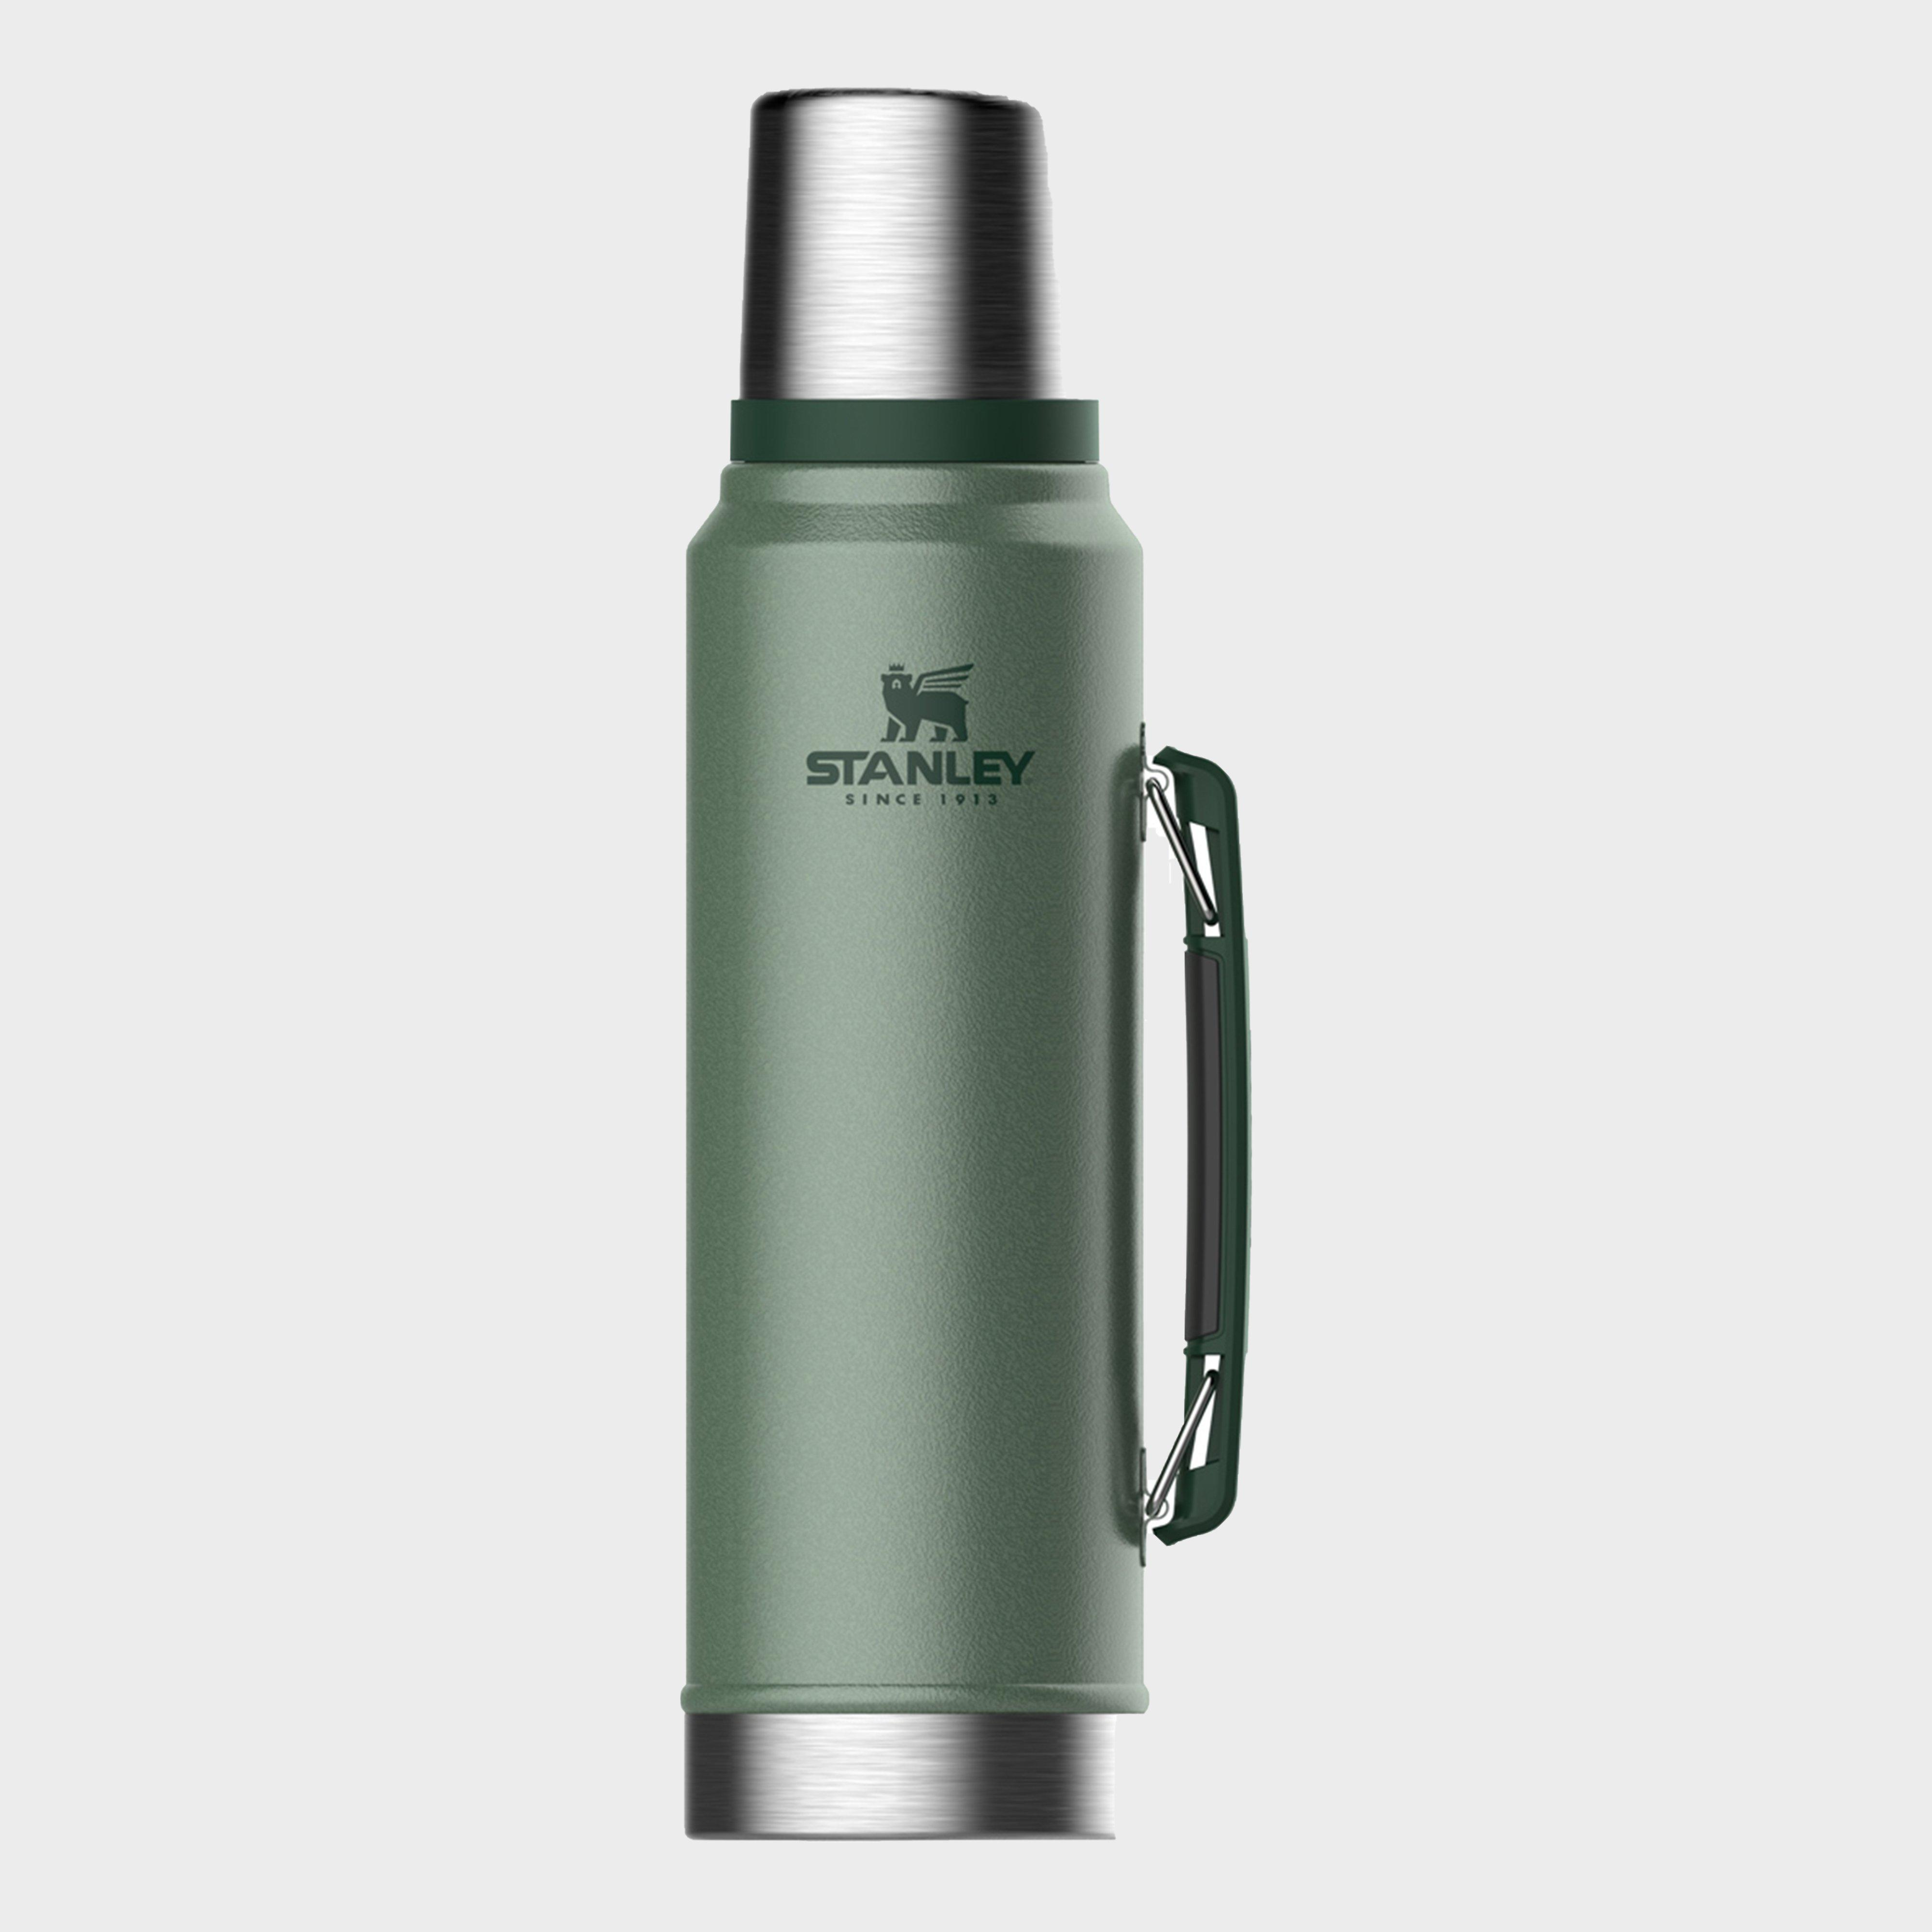 Stanley Classic Vacuum Bottle 1.0L - Green/1.0, Green